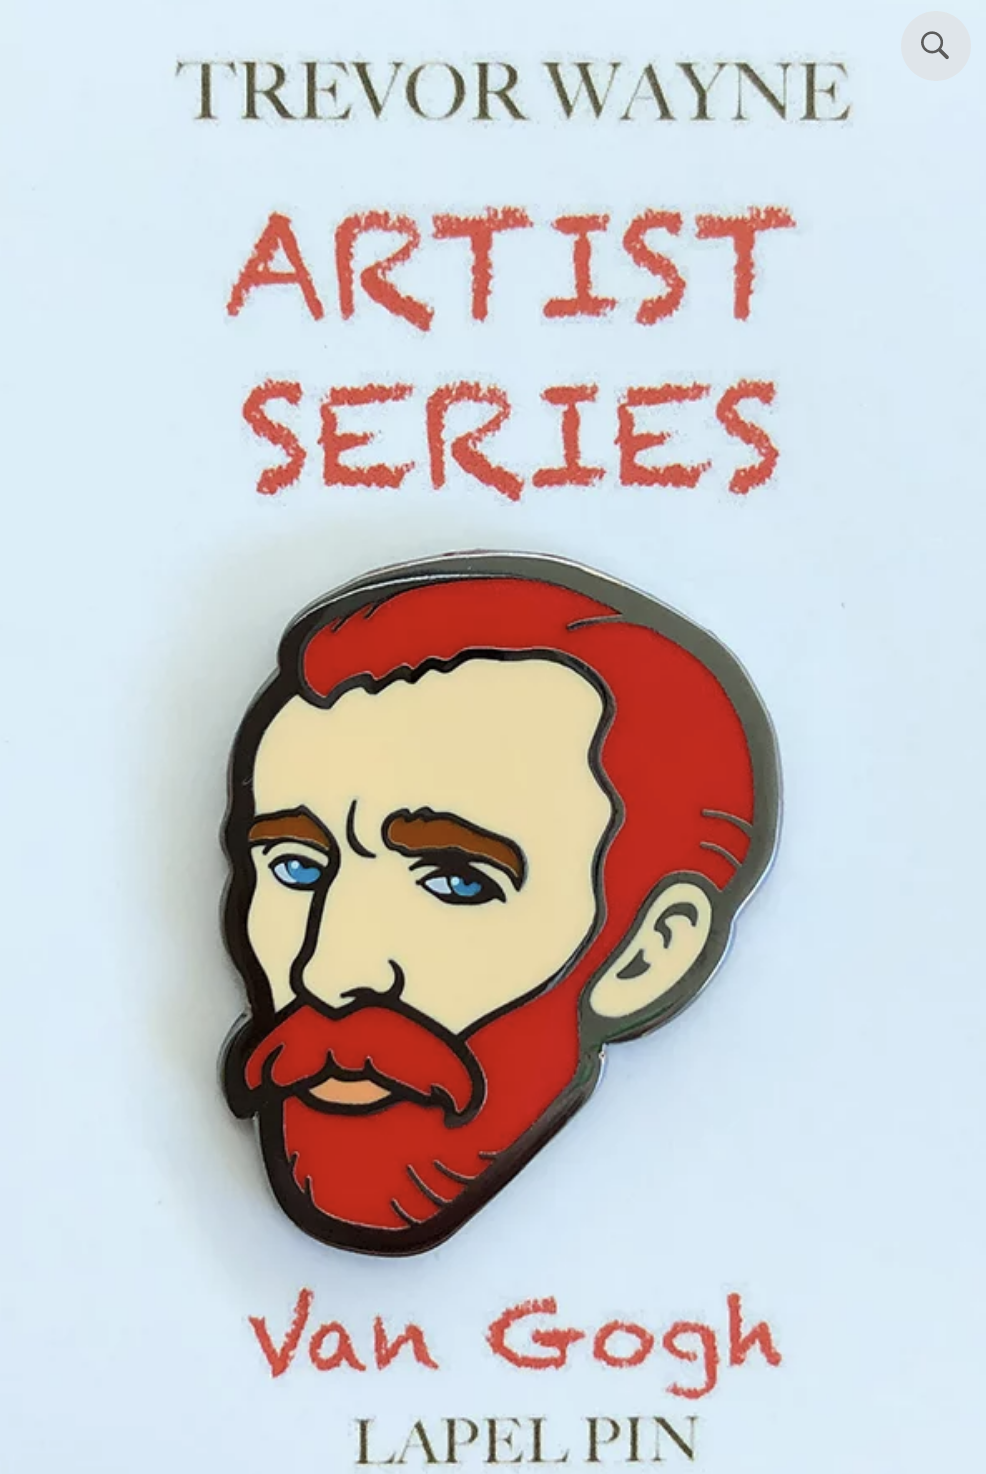 Van Gogh Pin